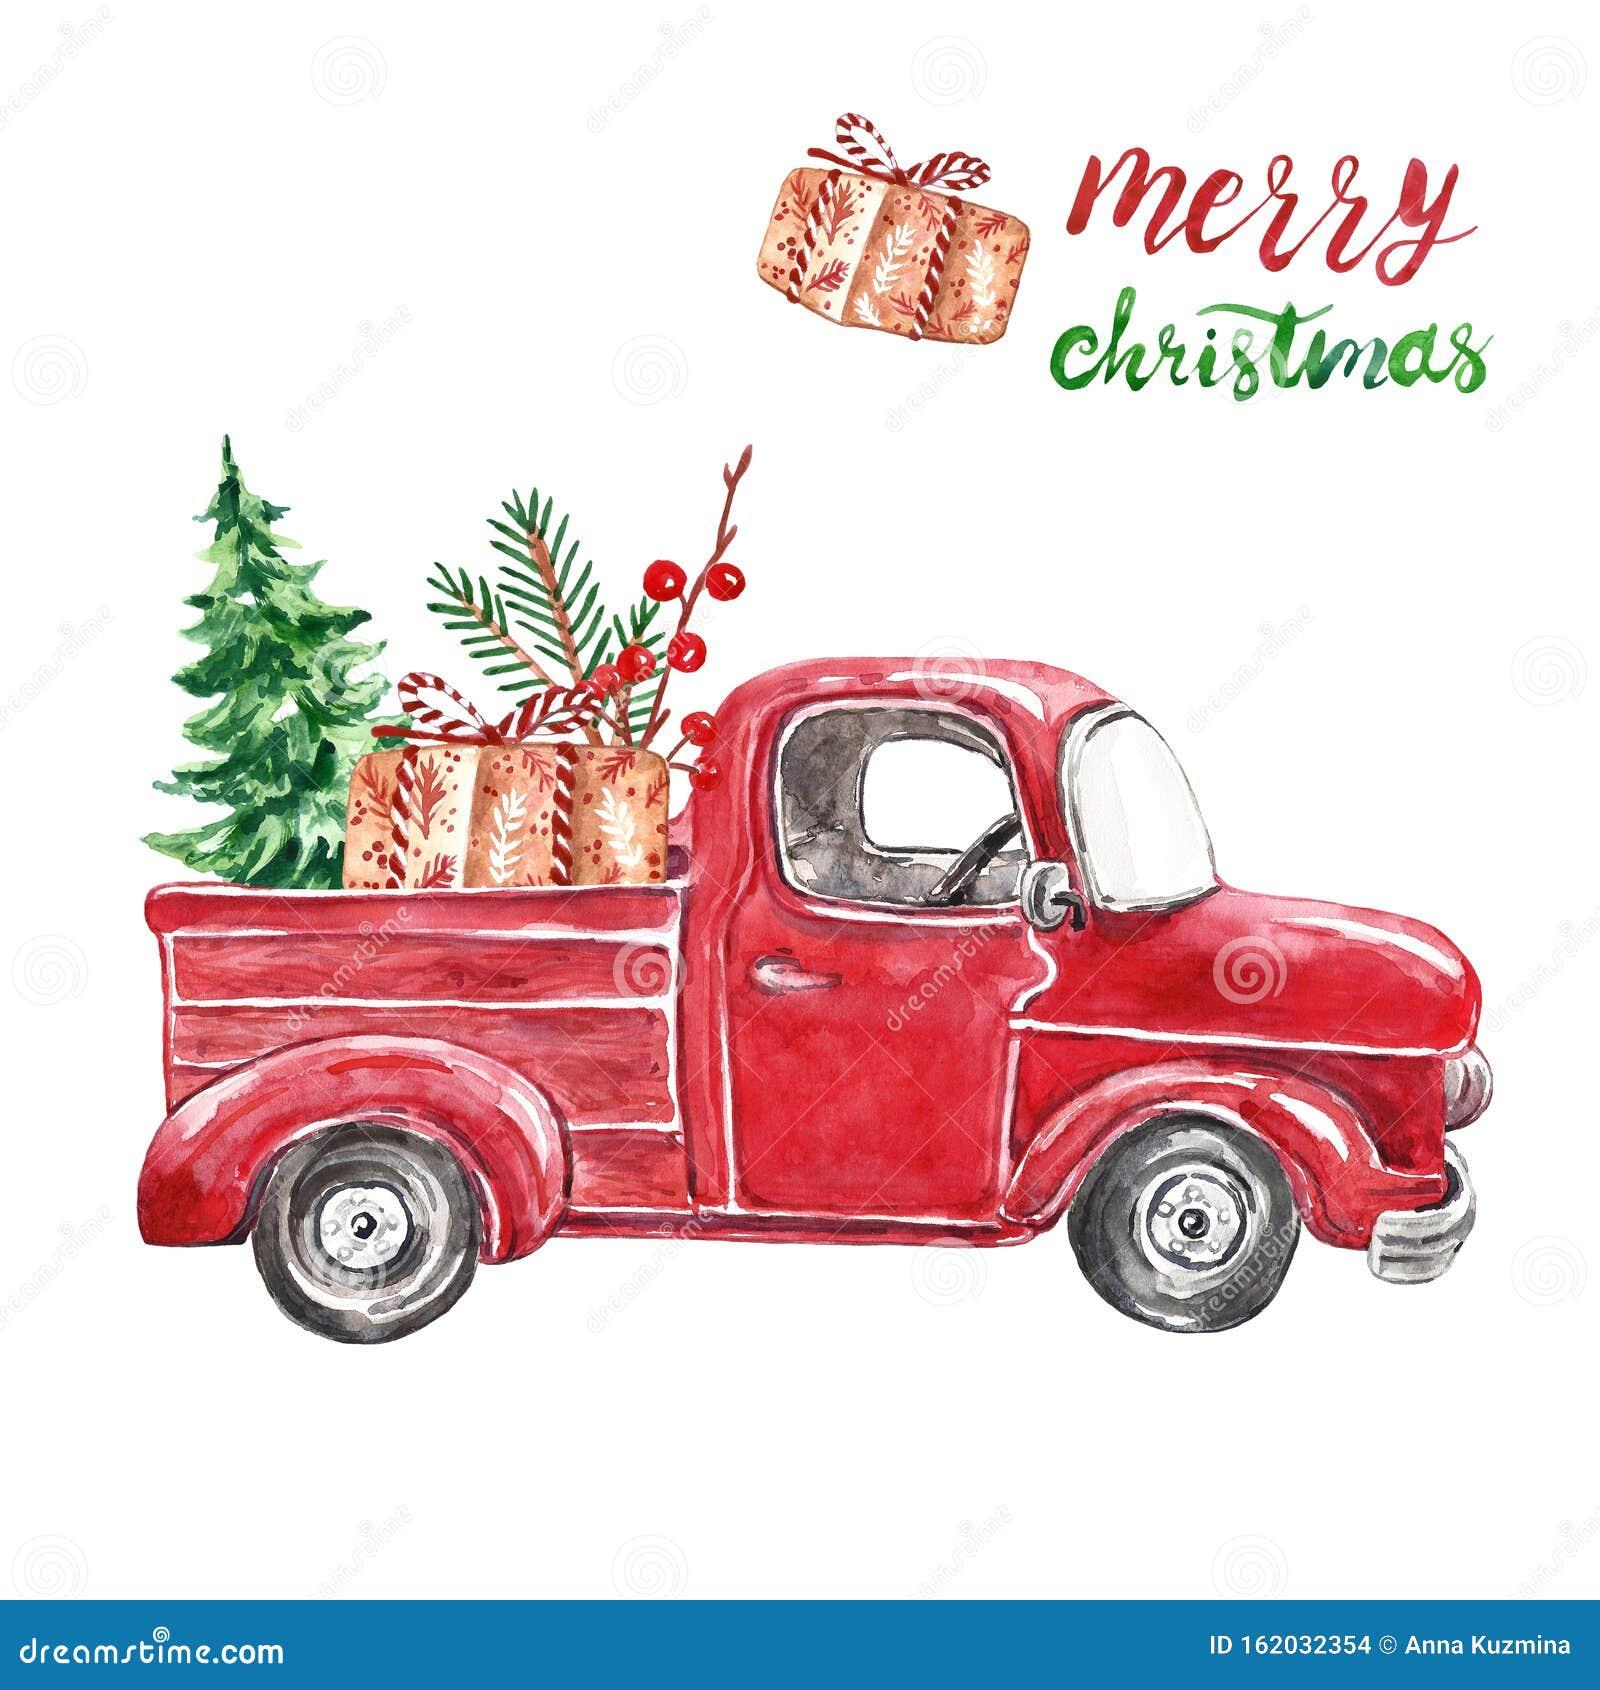 Christmas Truck Stock Illustrations 3 052 Christmas Truck Stock Illustrations Vectors Clipart Dreamstime